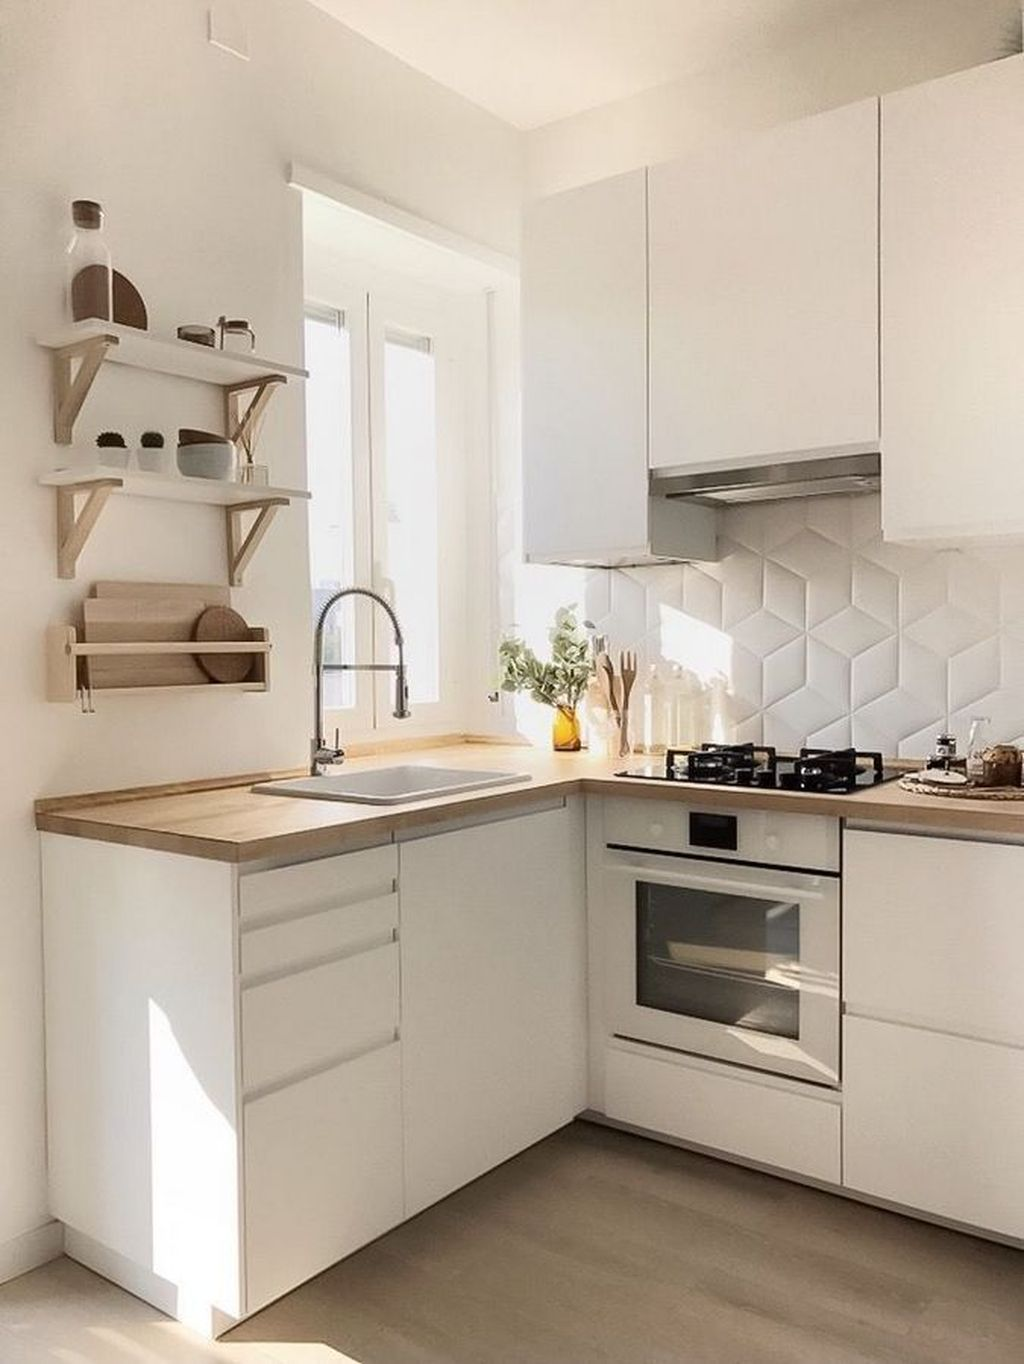 simple interior design for kitchen